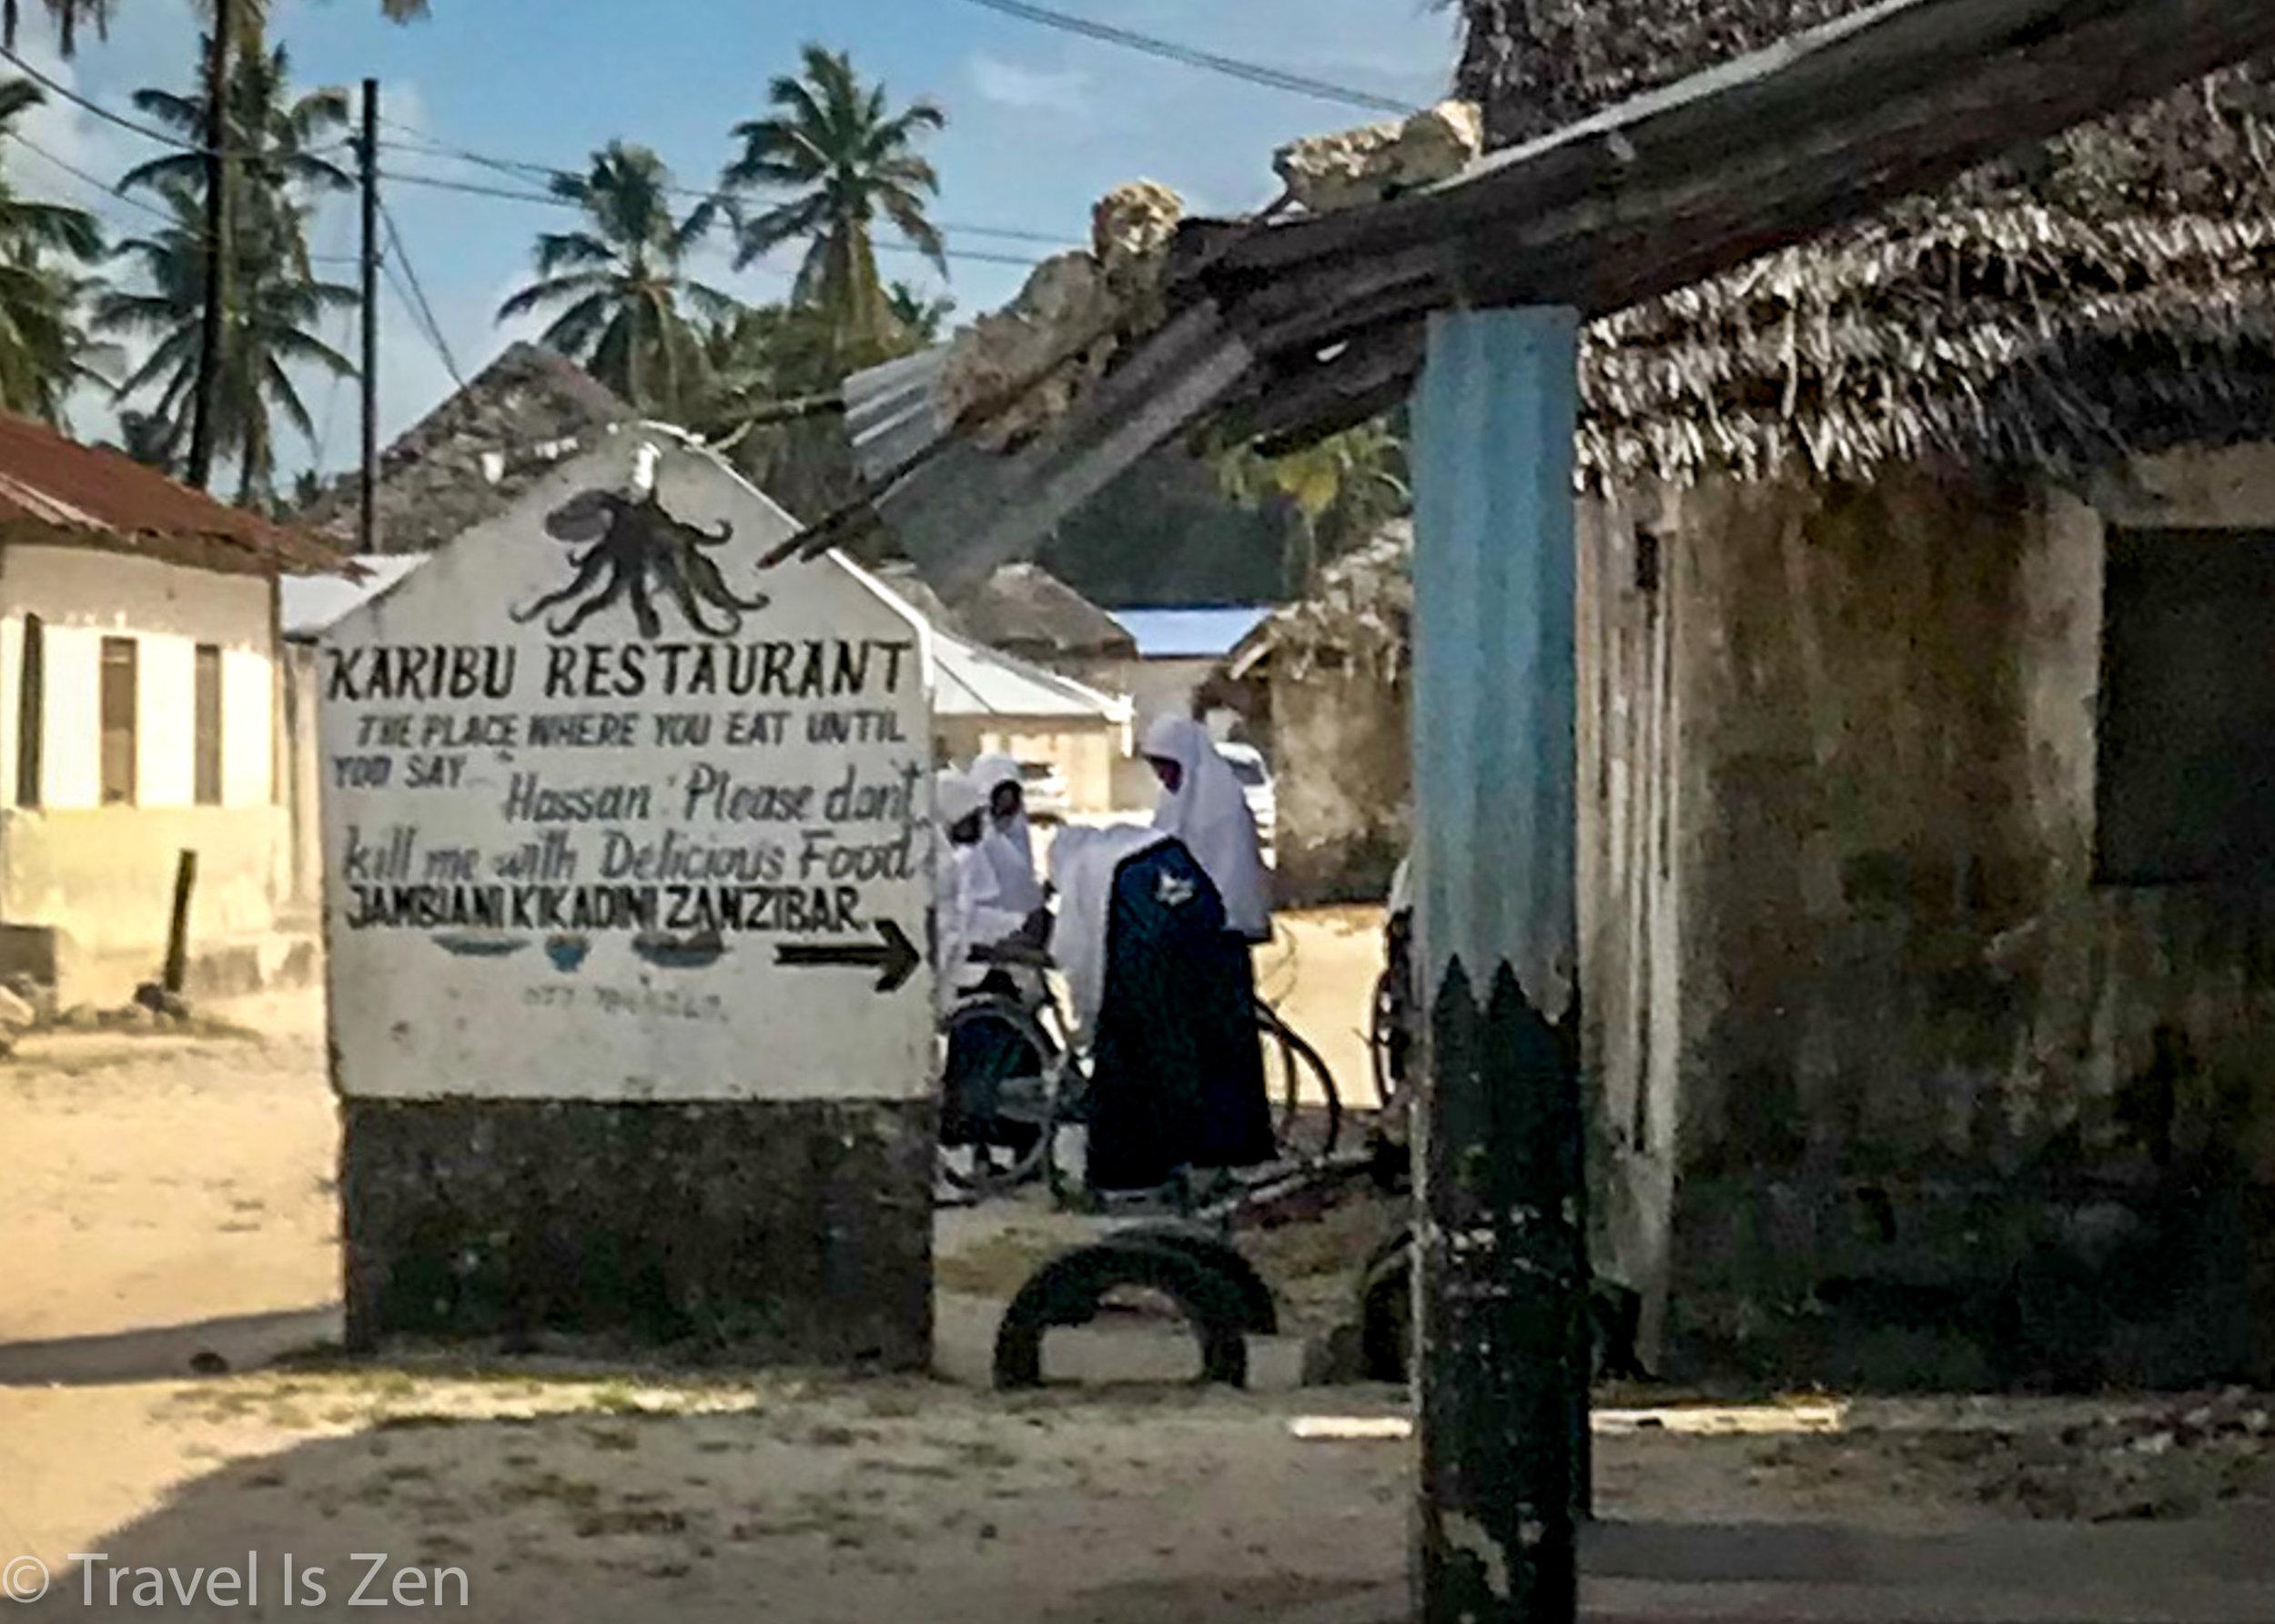 Karibu Restaurant, Jambiani